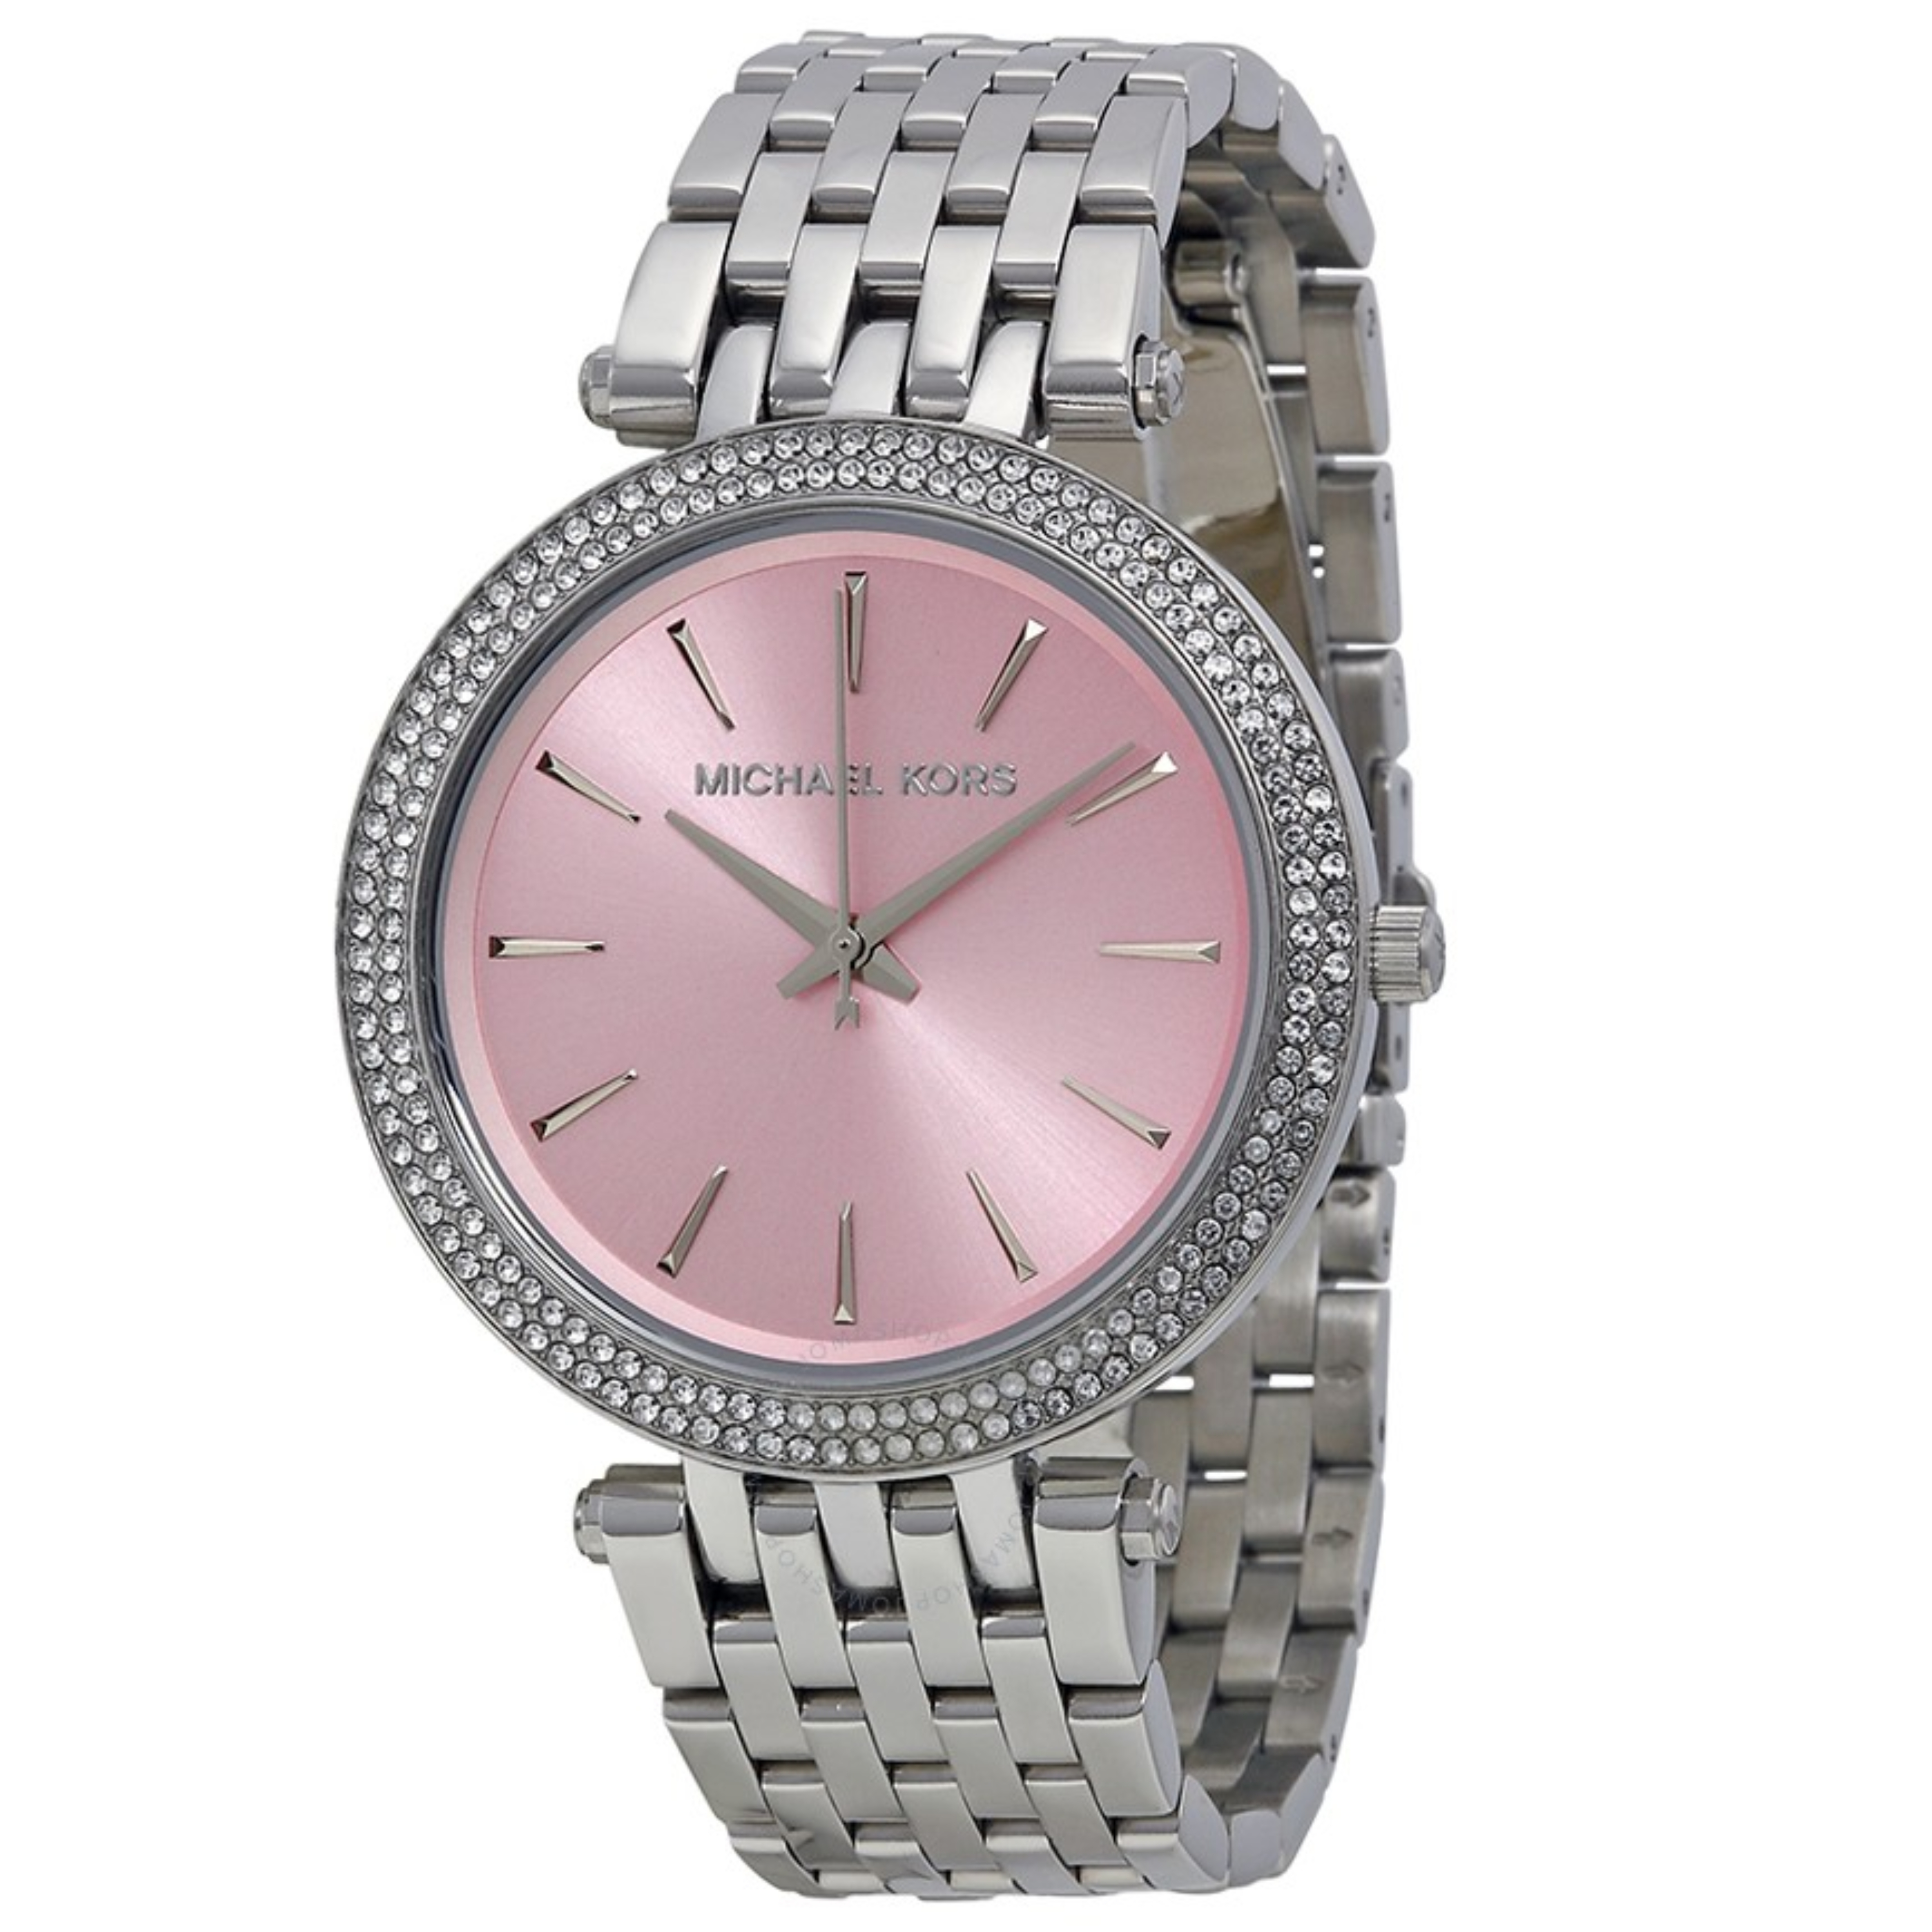 Michael Kors Darci Ladies Watch | Pink Dial Pave Bezel | Silver Bracelet Band | MK3352